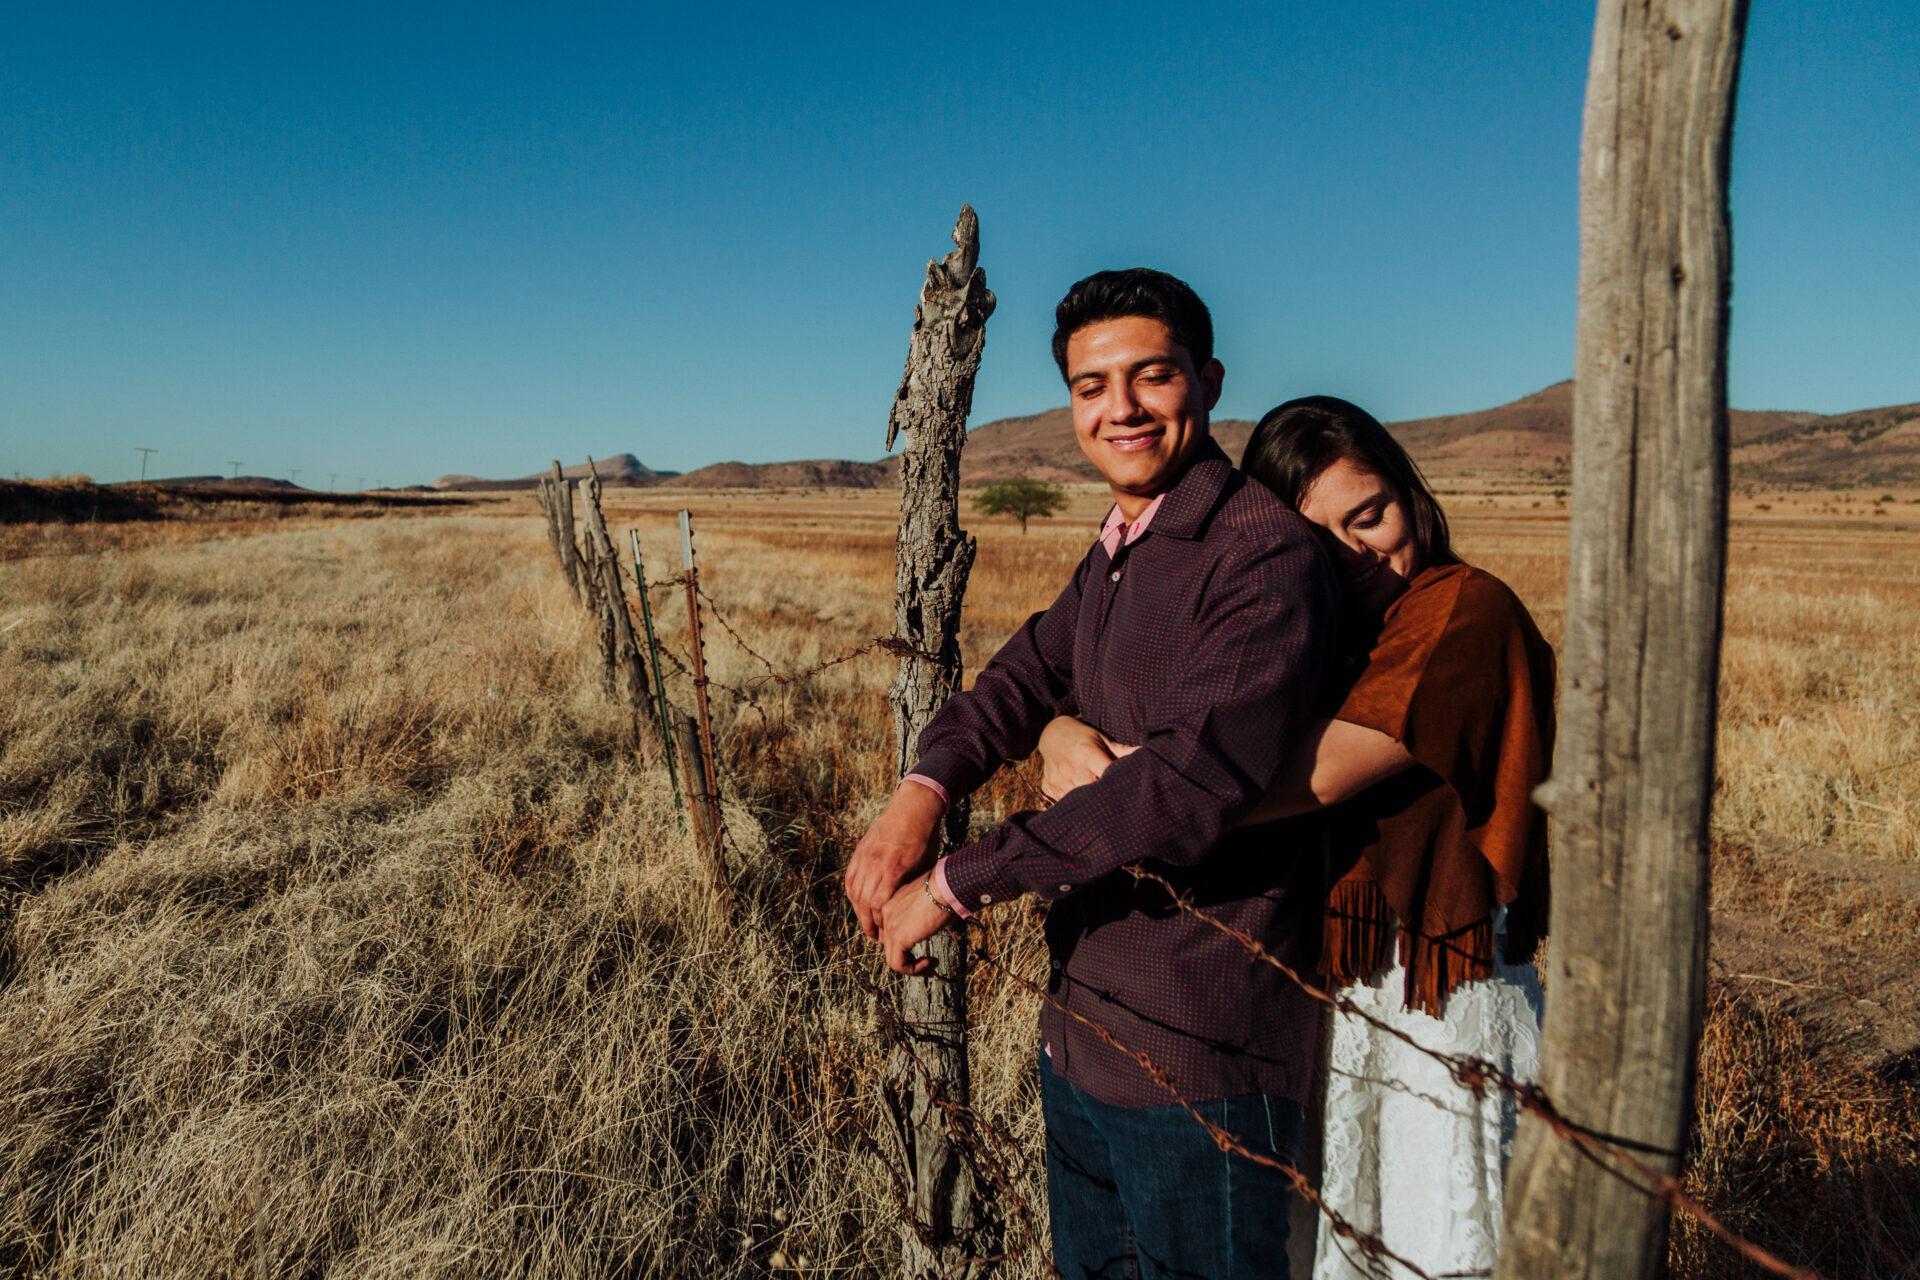 javier_noriega_fotografo_bodas_zacatecas_chihuahua_wedding_photographer4